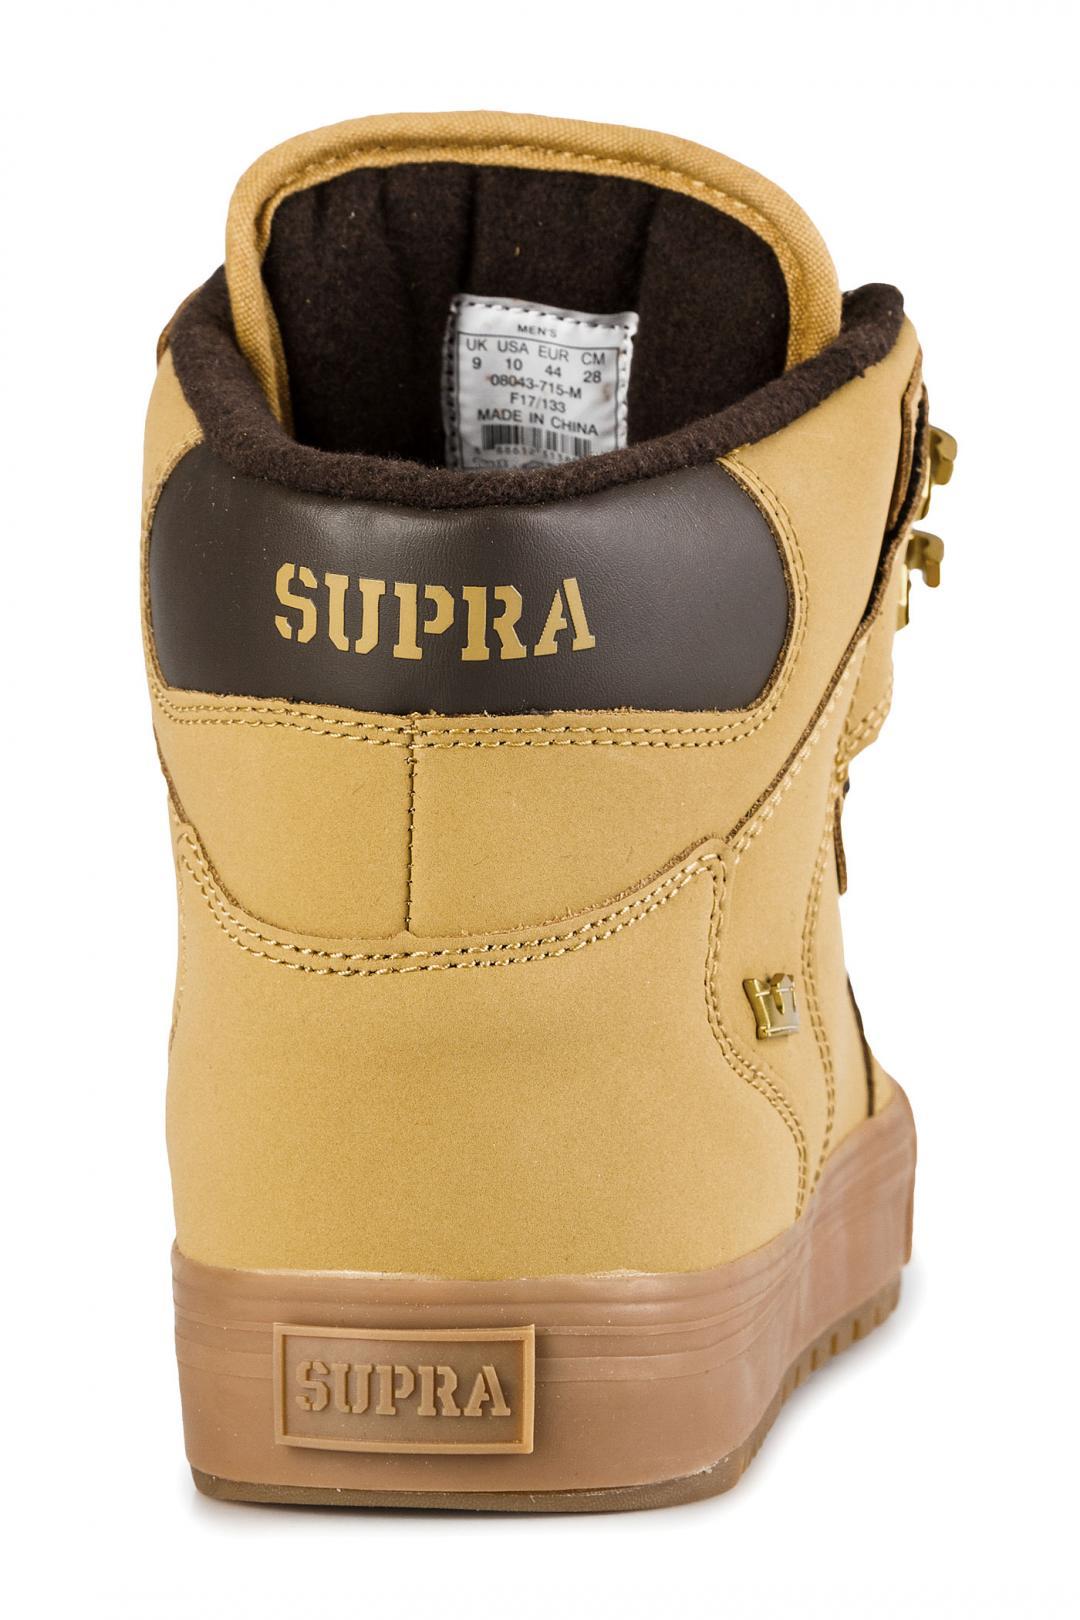 Uomo Supra Vaider CW amber gold light gum | Sneakers high top